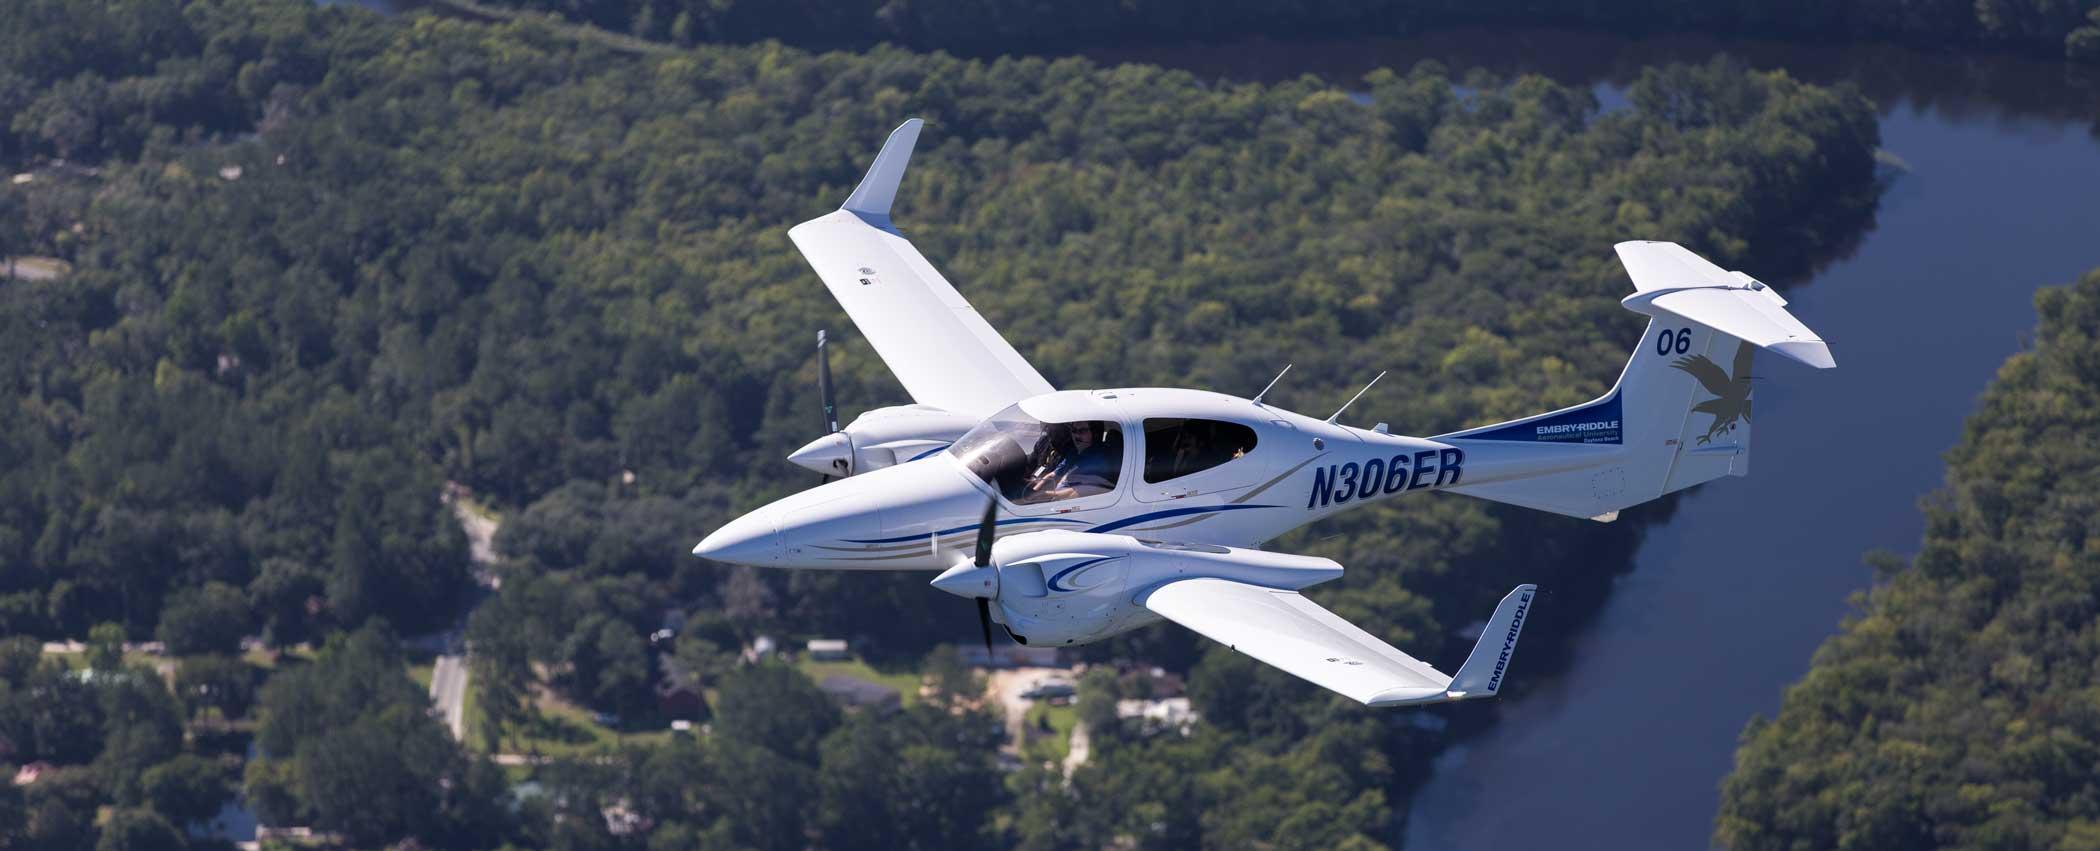 Degrees Programs Embry Riddle Aeronautical University